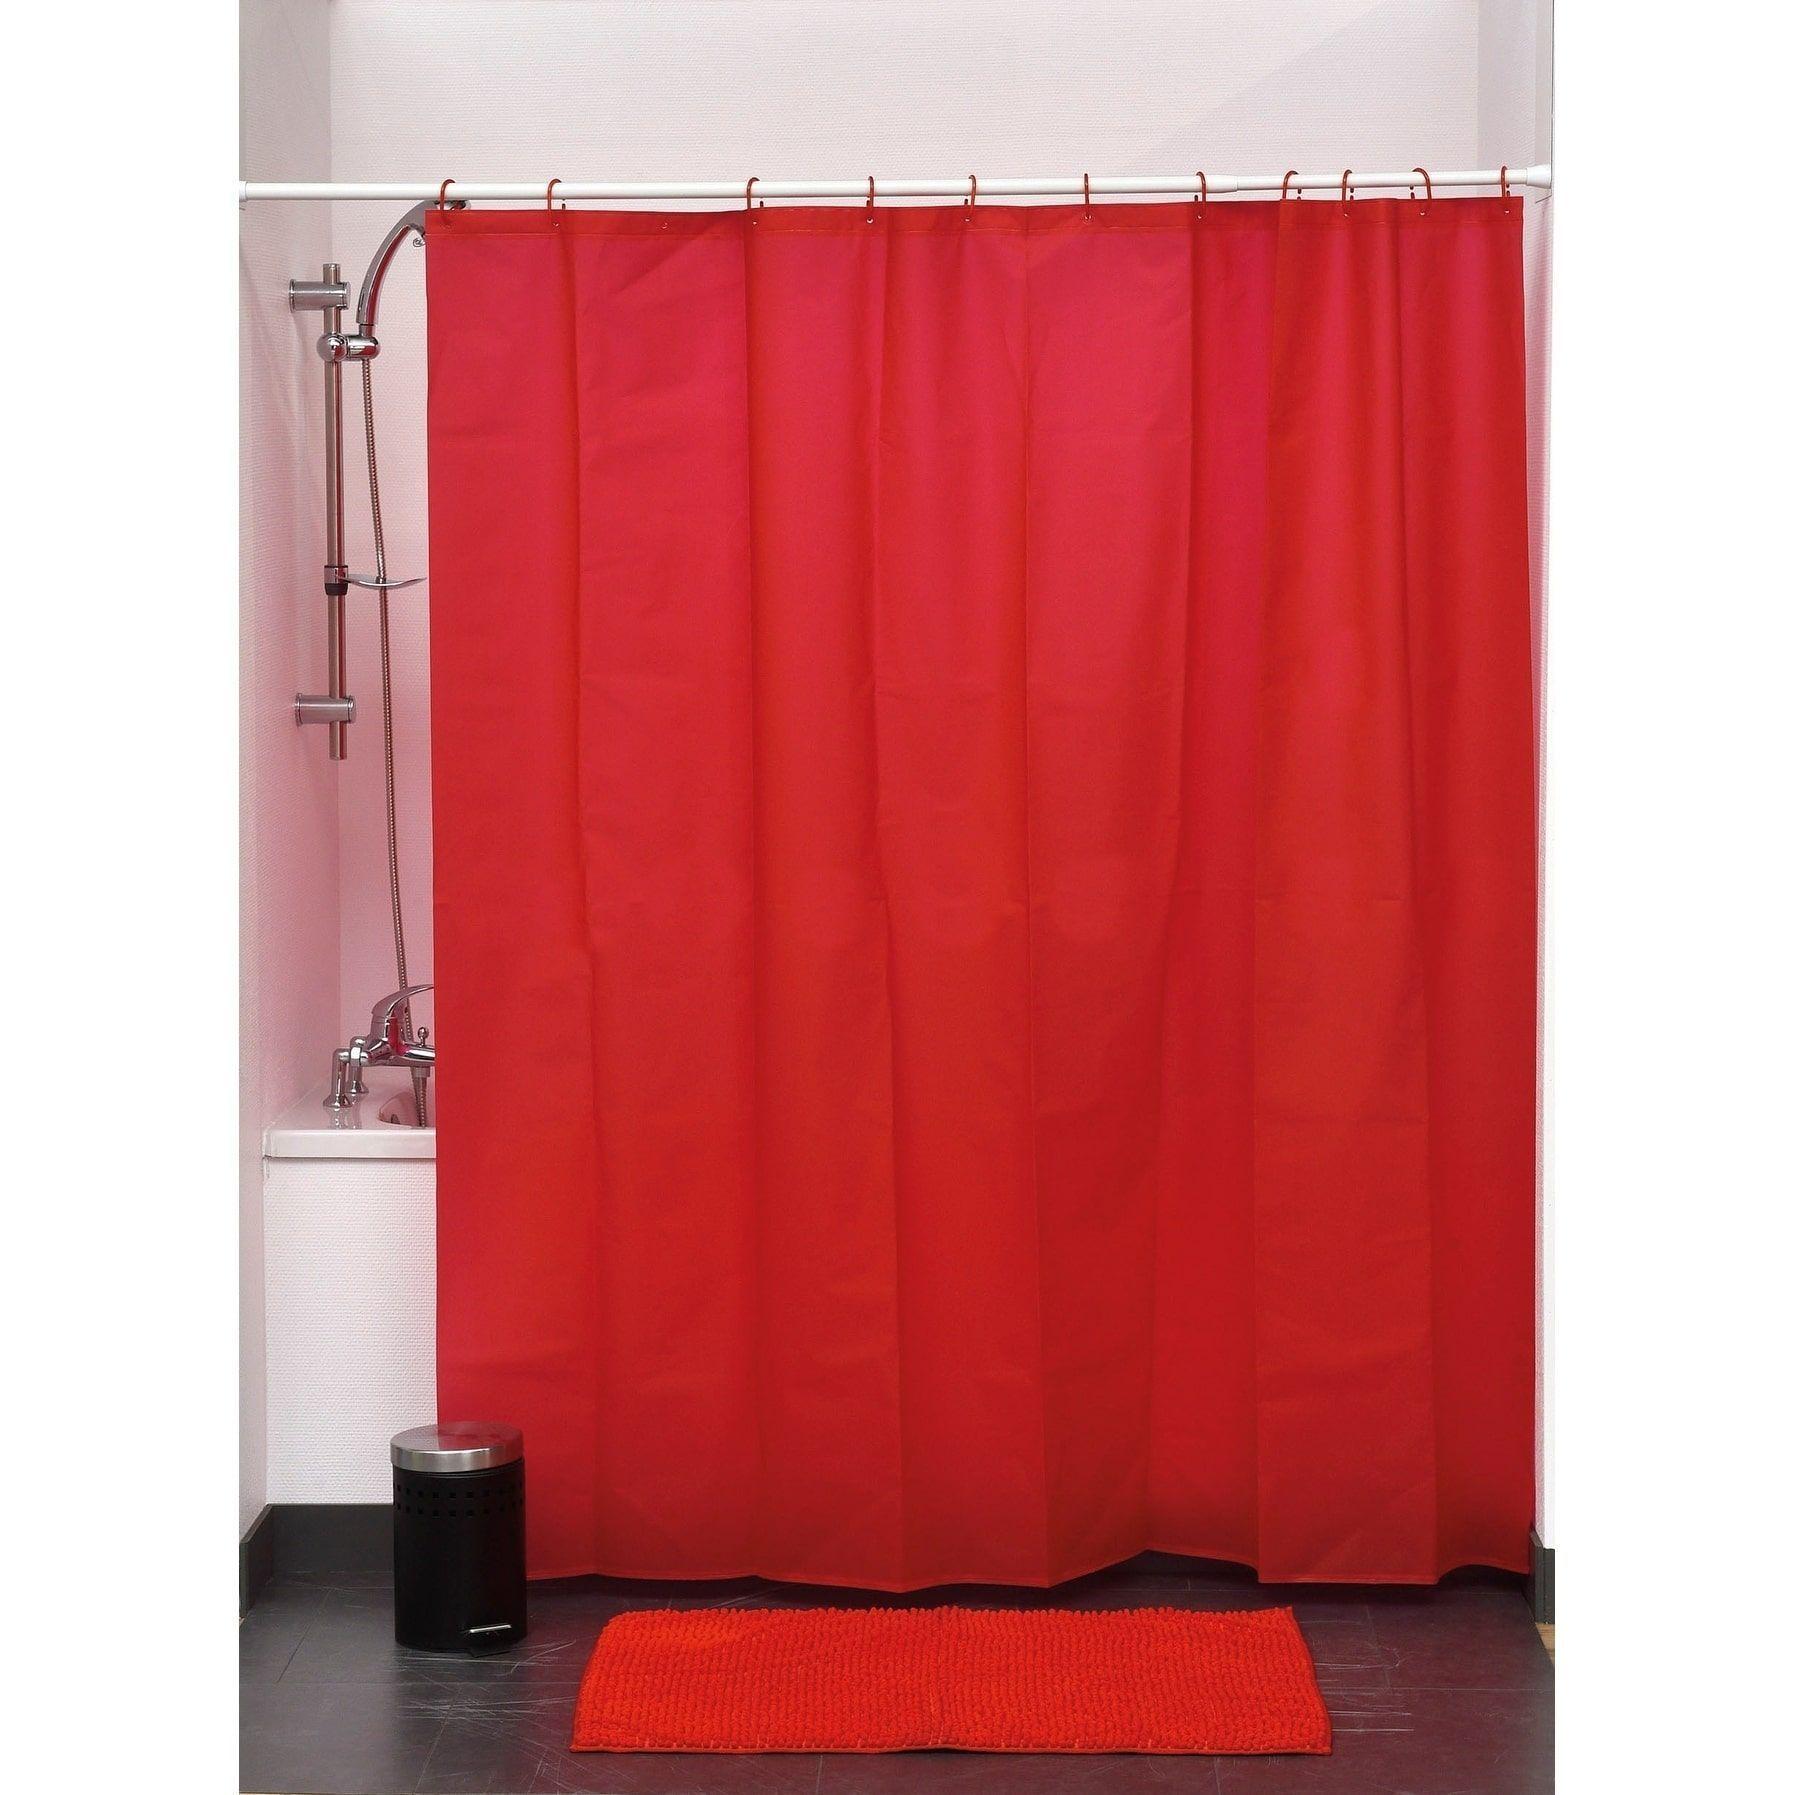 Evideco Bathroom Shower Curtain Eva Solid Color Red Bathroom